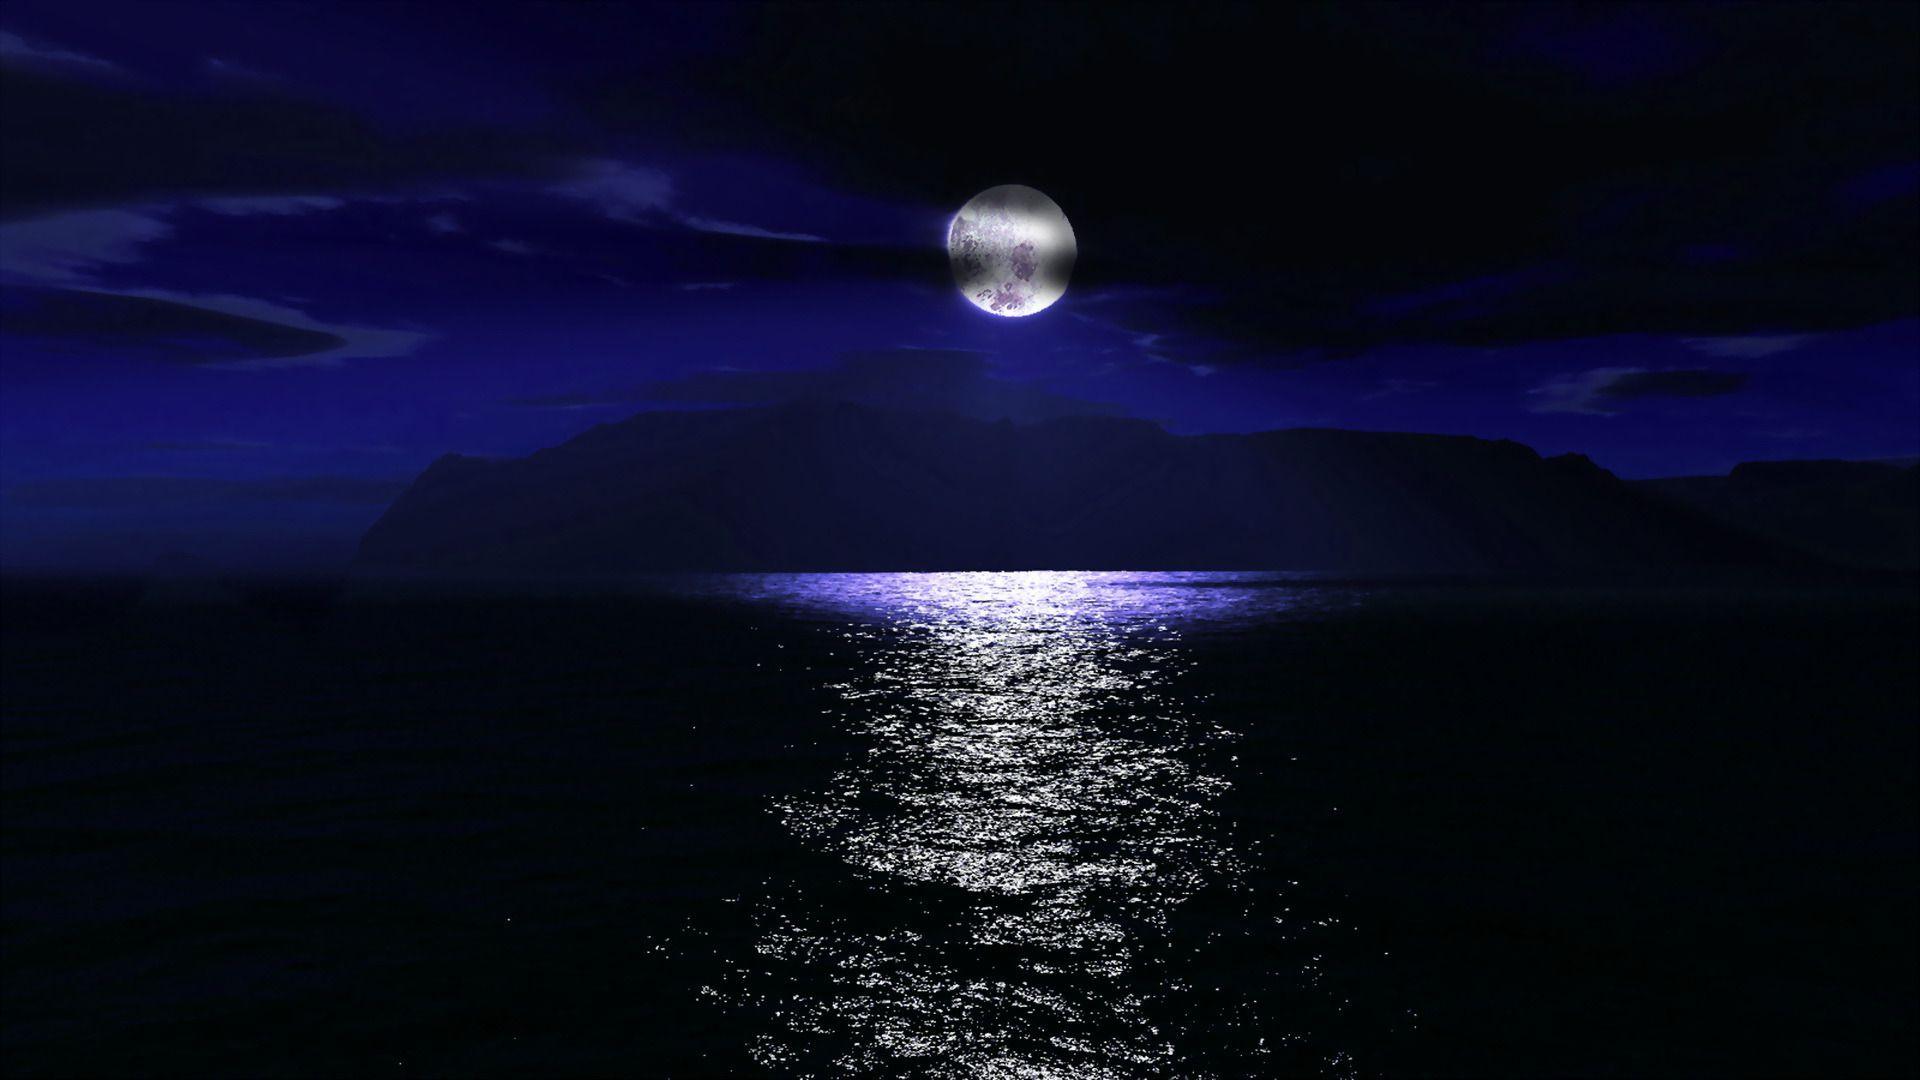 moon over ocean wallpaper wallpapersafari